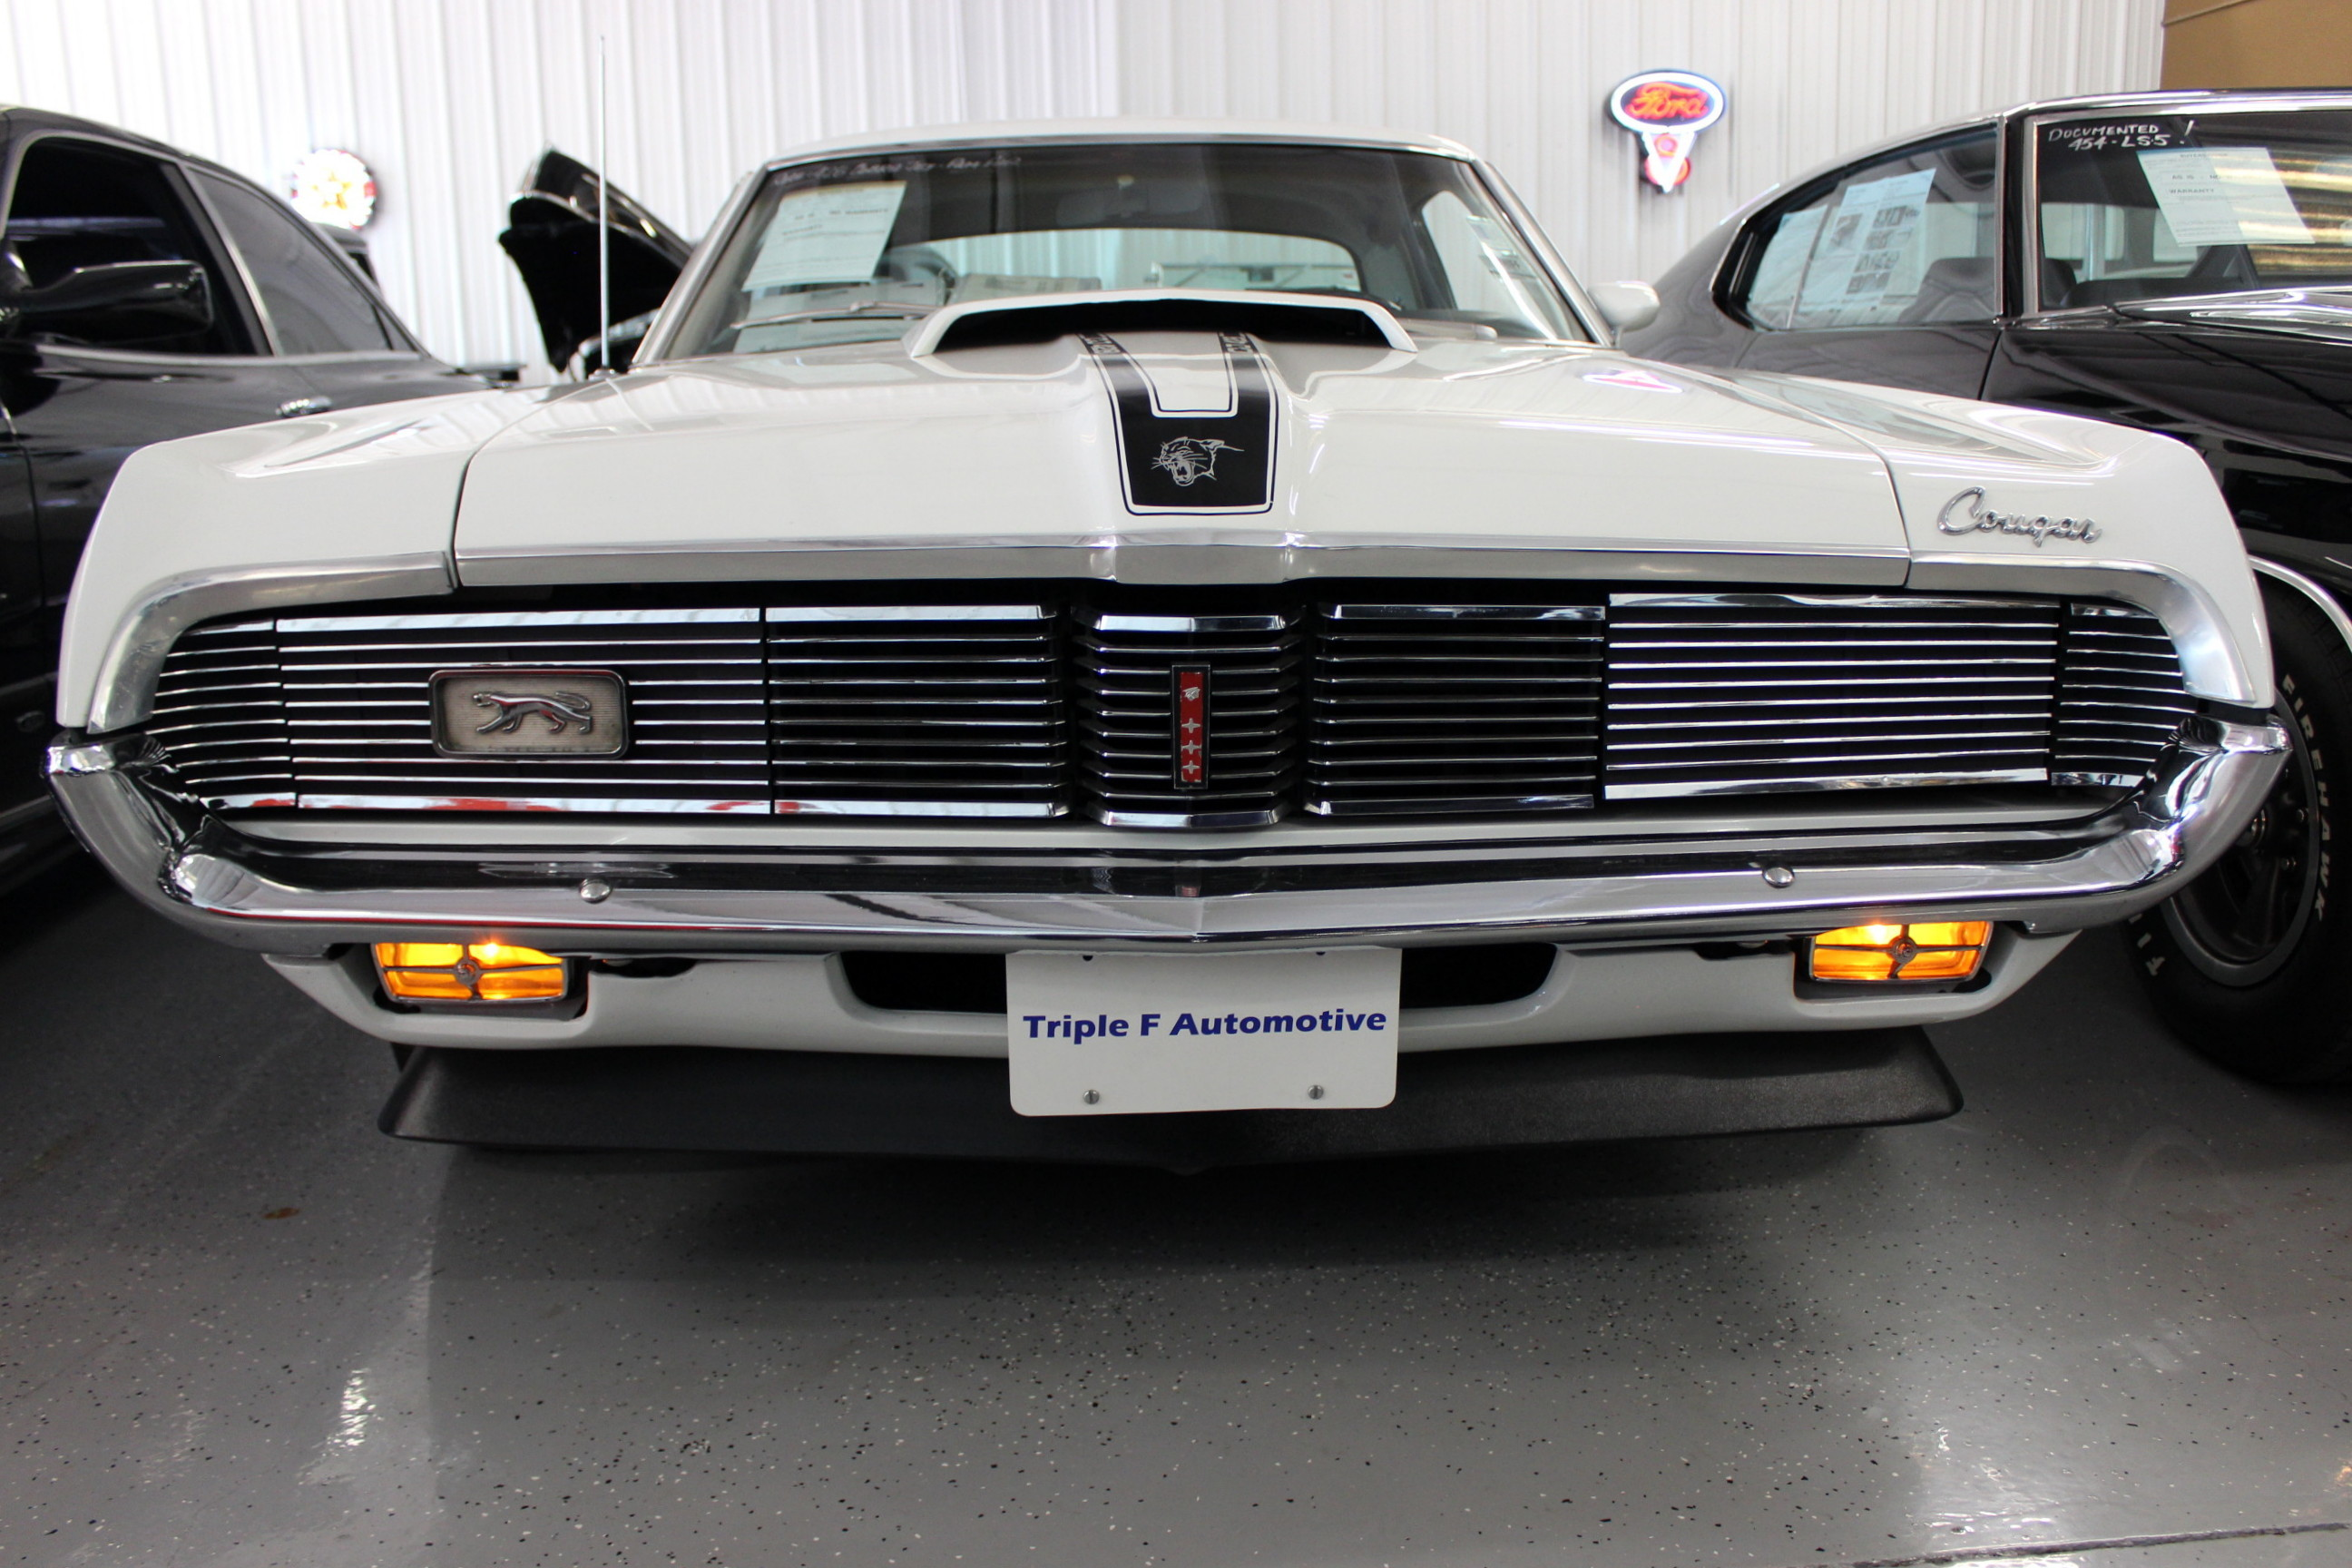 1969 mercury cougar triple f automotive for 1969 mercury cougar interior parts